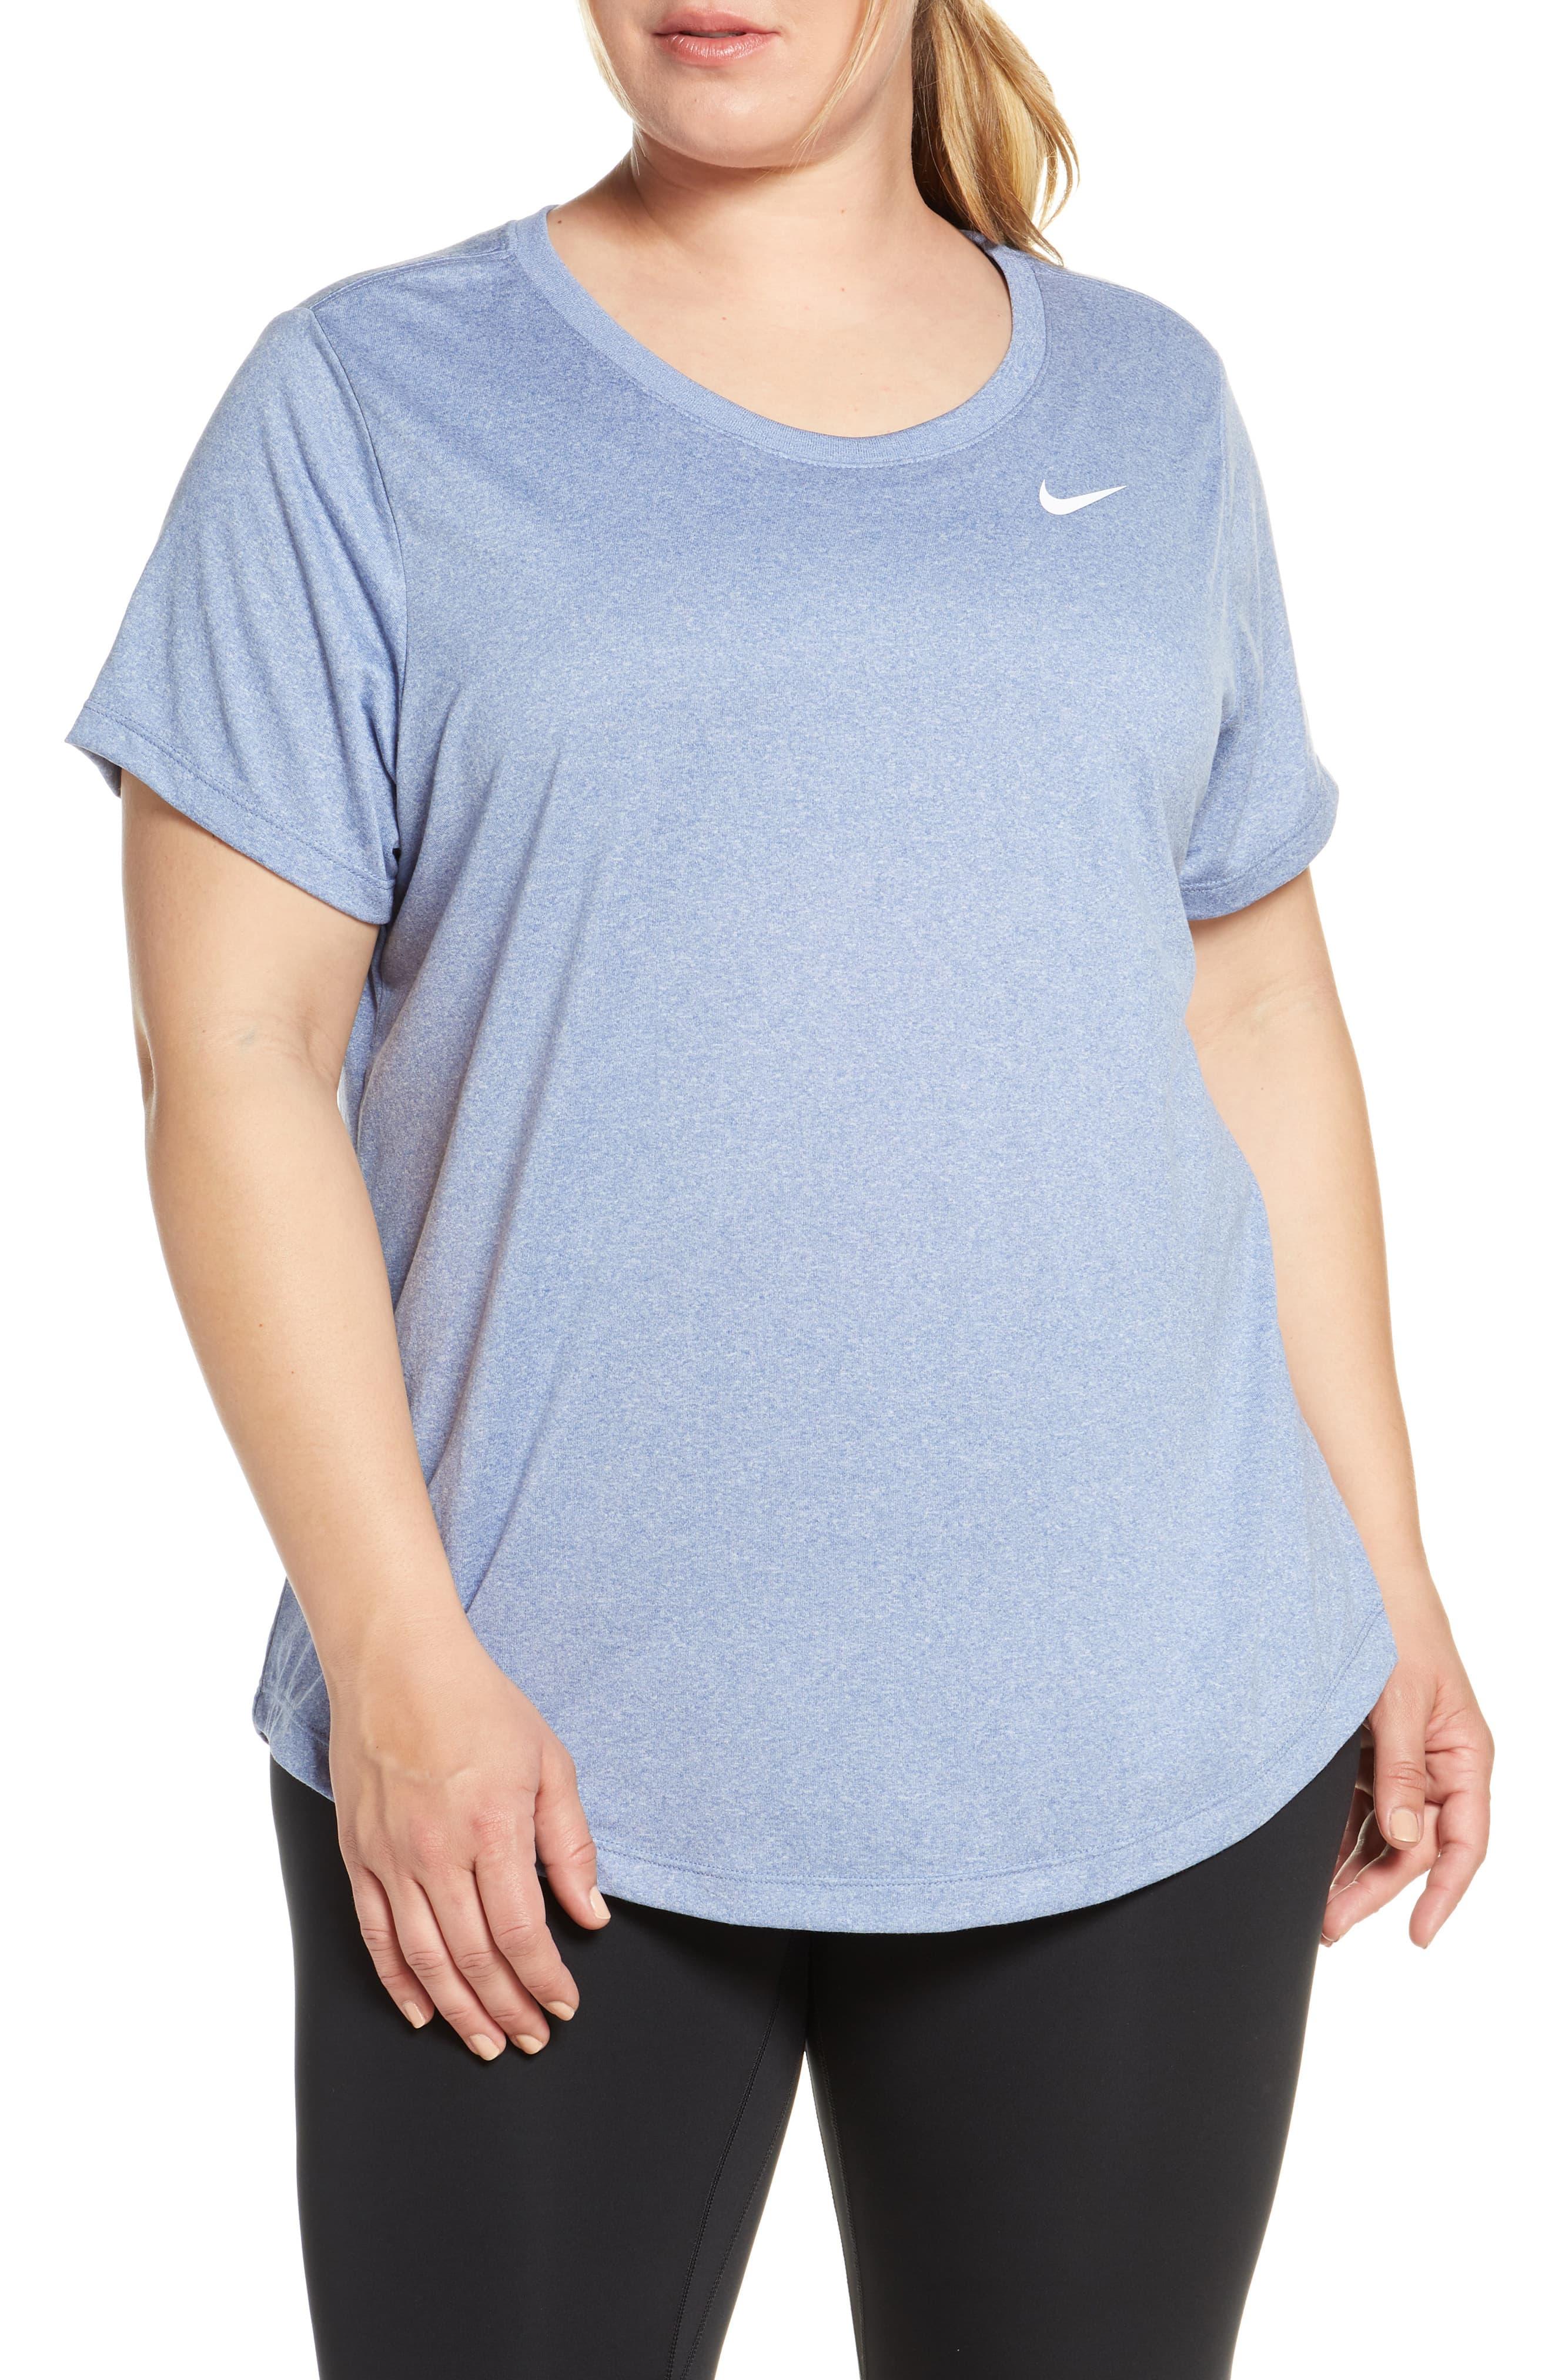 Plus Size Women's Nike Dri Fit Legend T Shirt, Size 3X